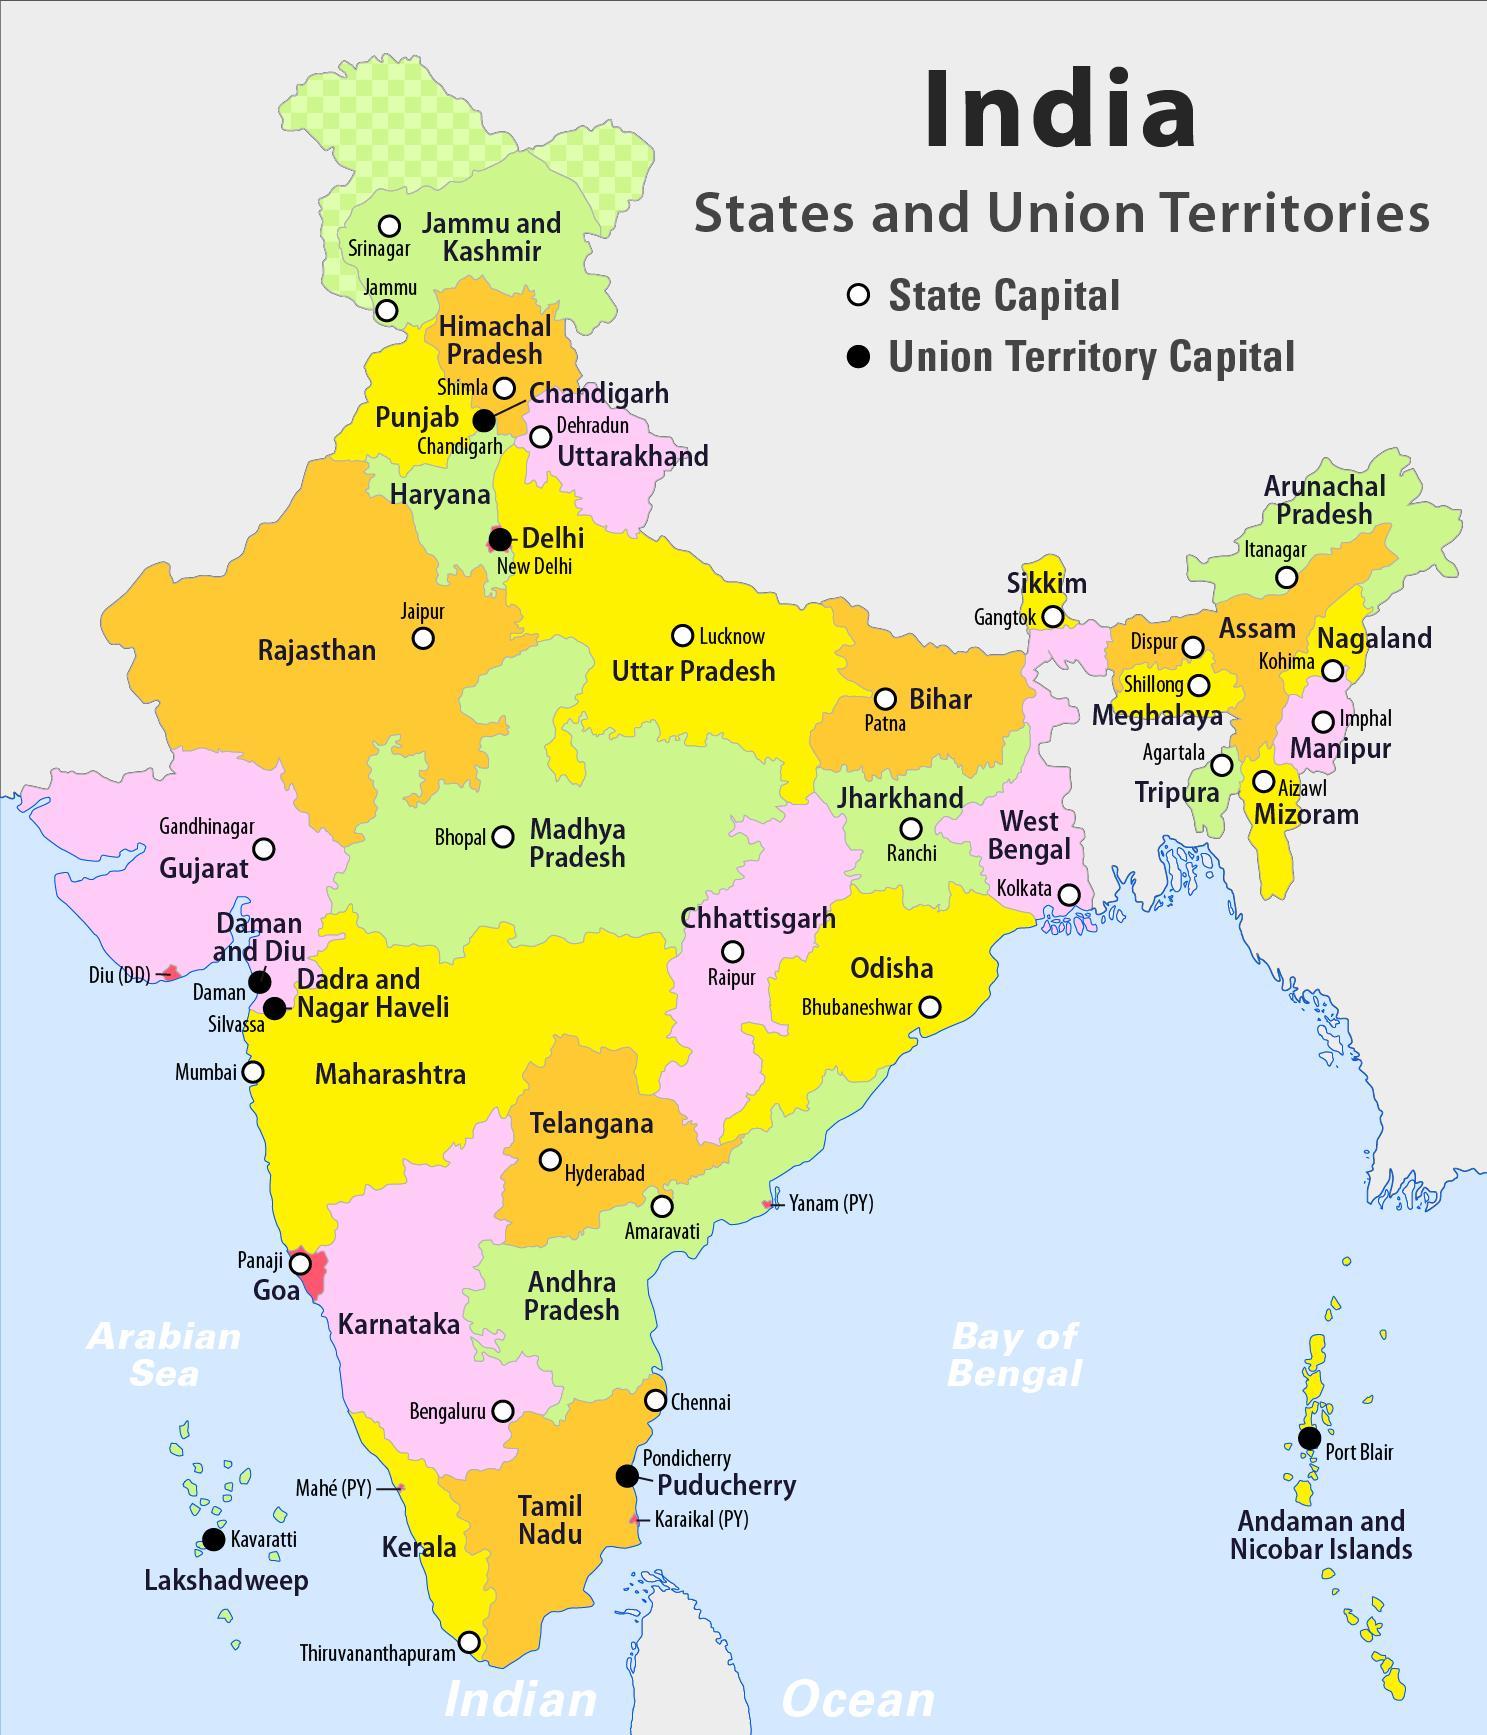 india kart India kart med stater hd   Hd India kart med stater (Sør Asia   Asia) india kart